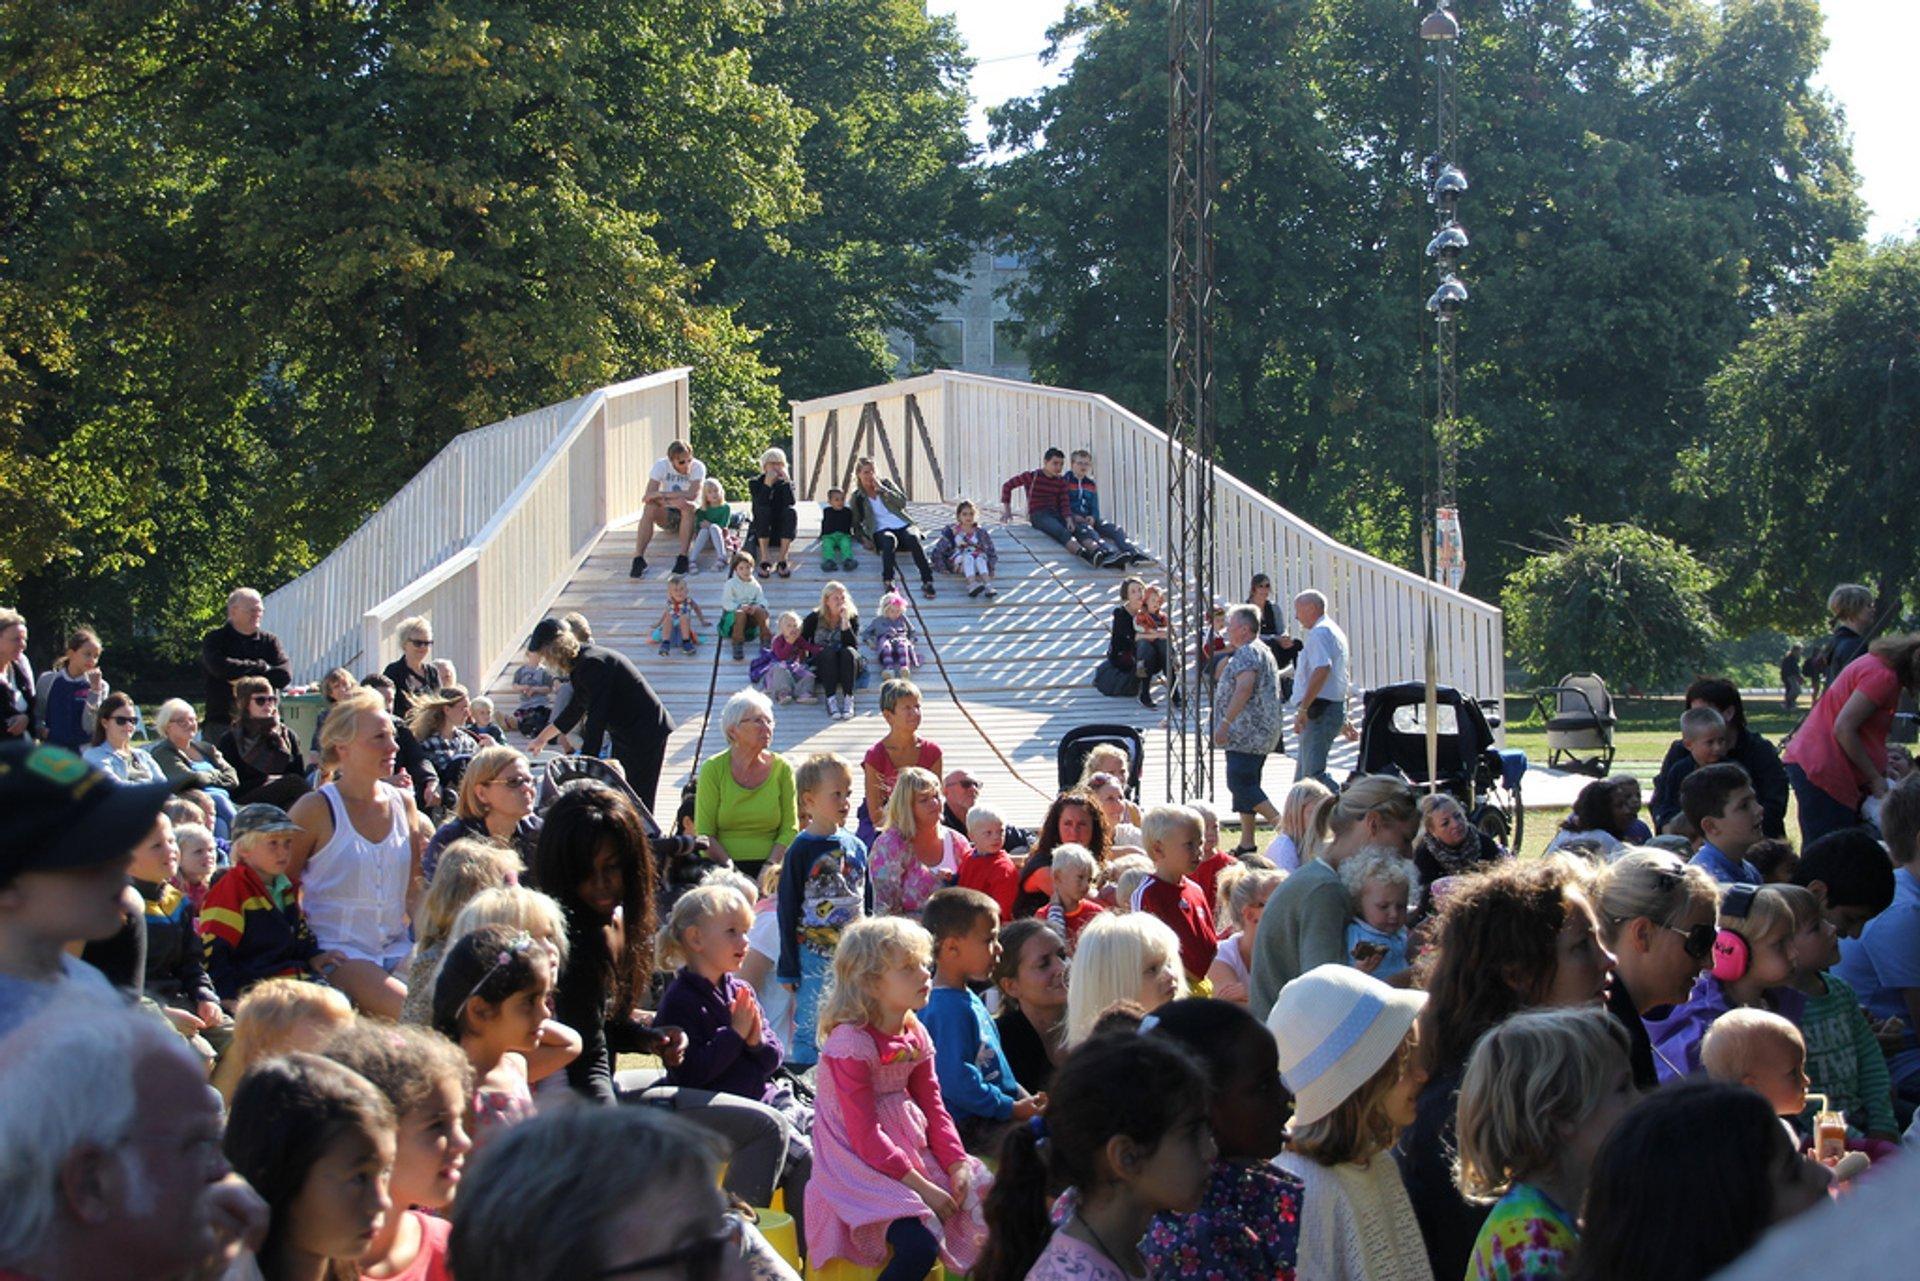 Aarhus Festival in Denmark 2020 - Best Time